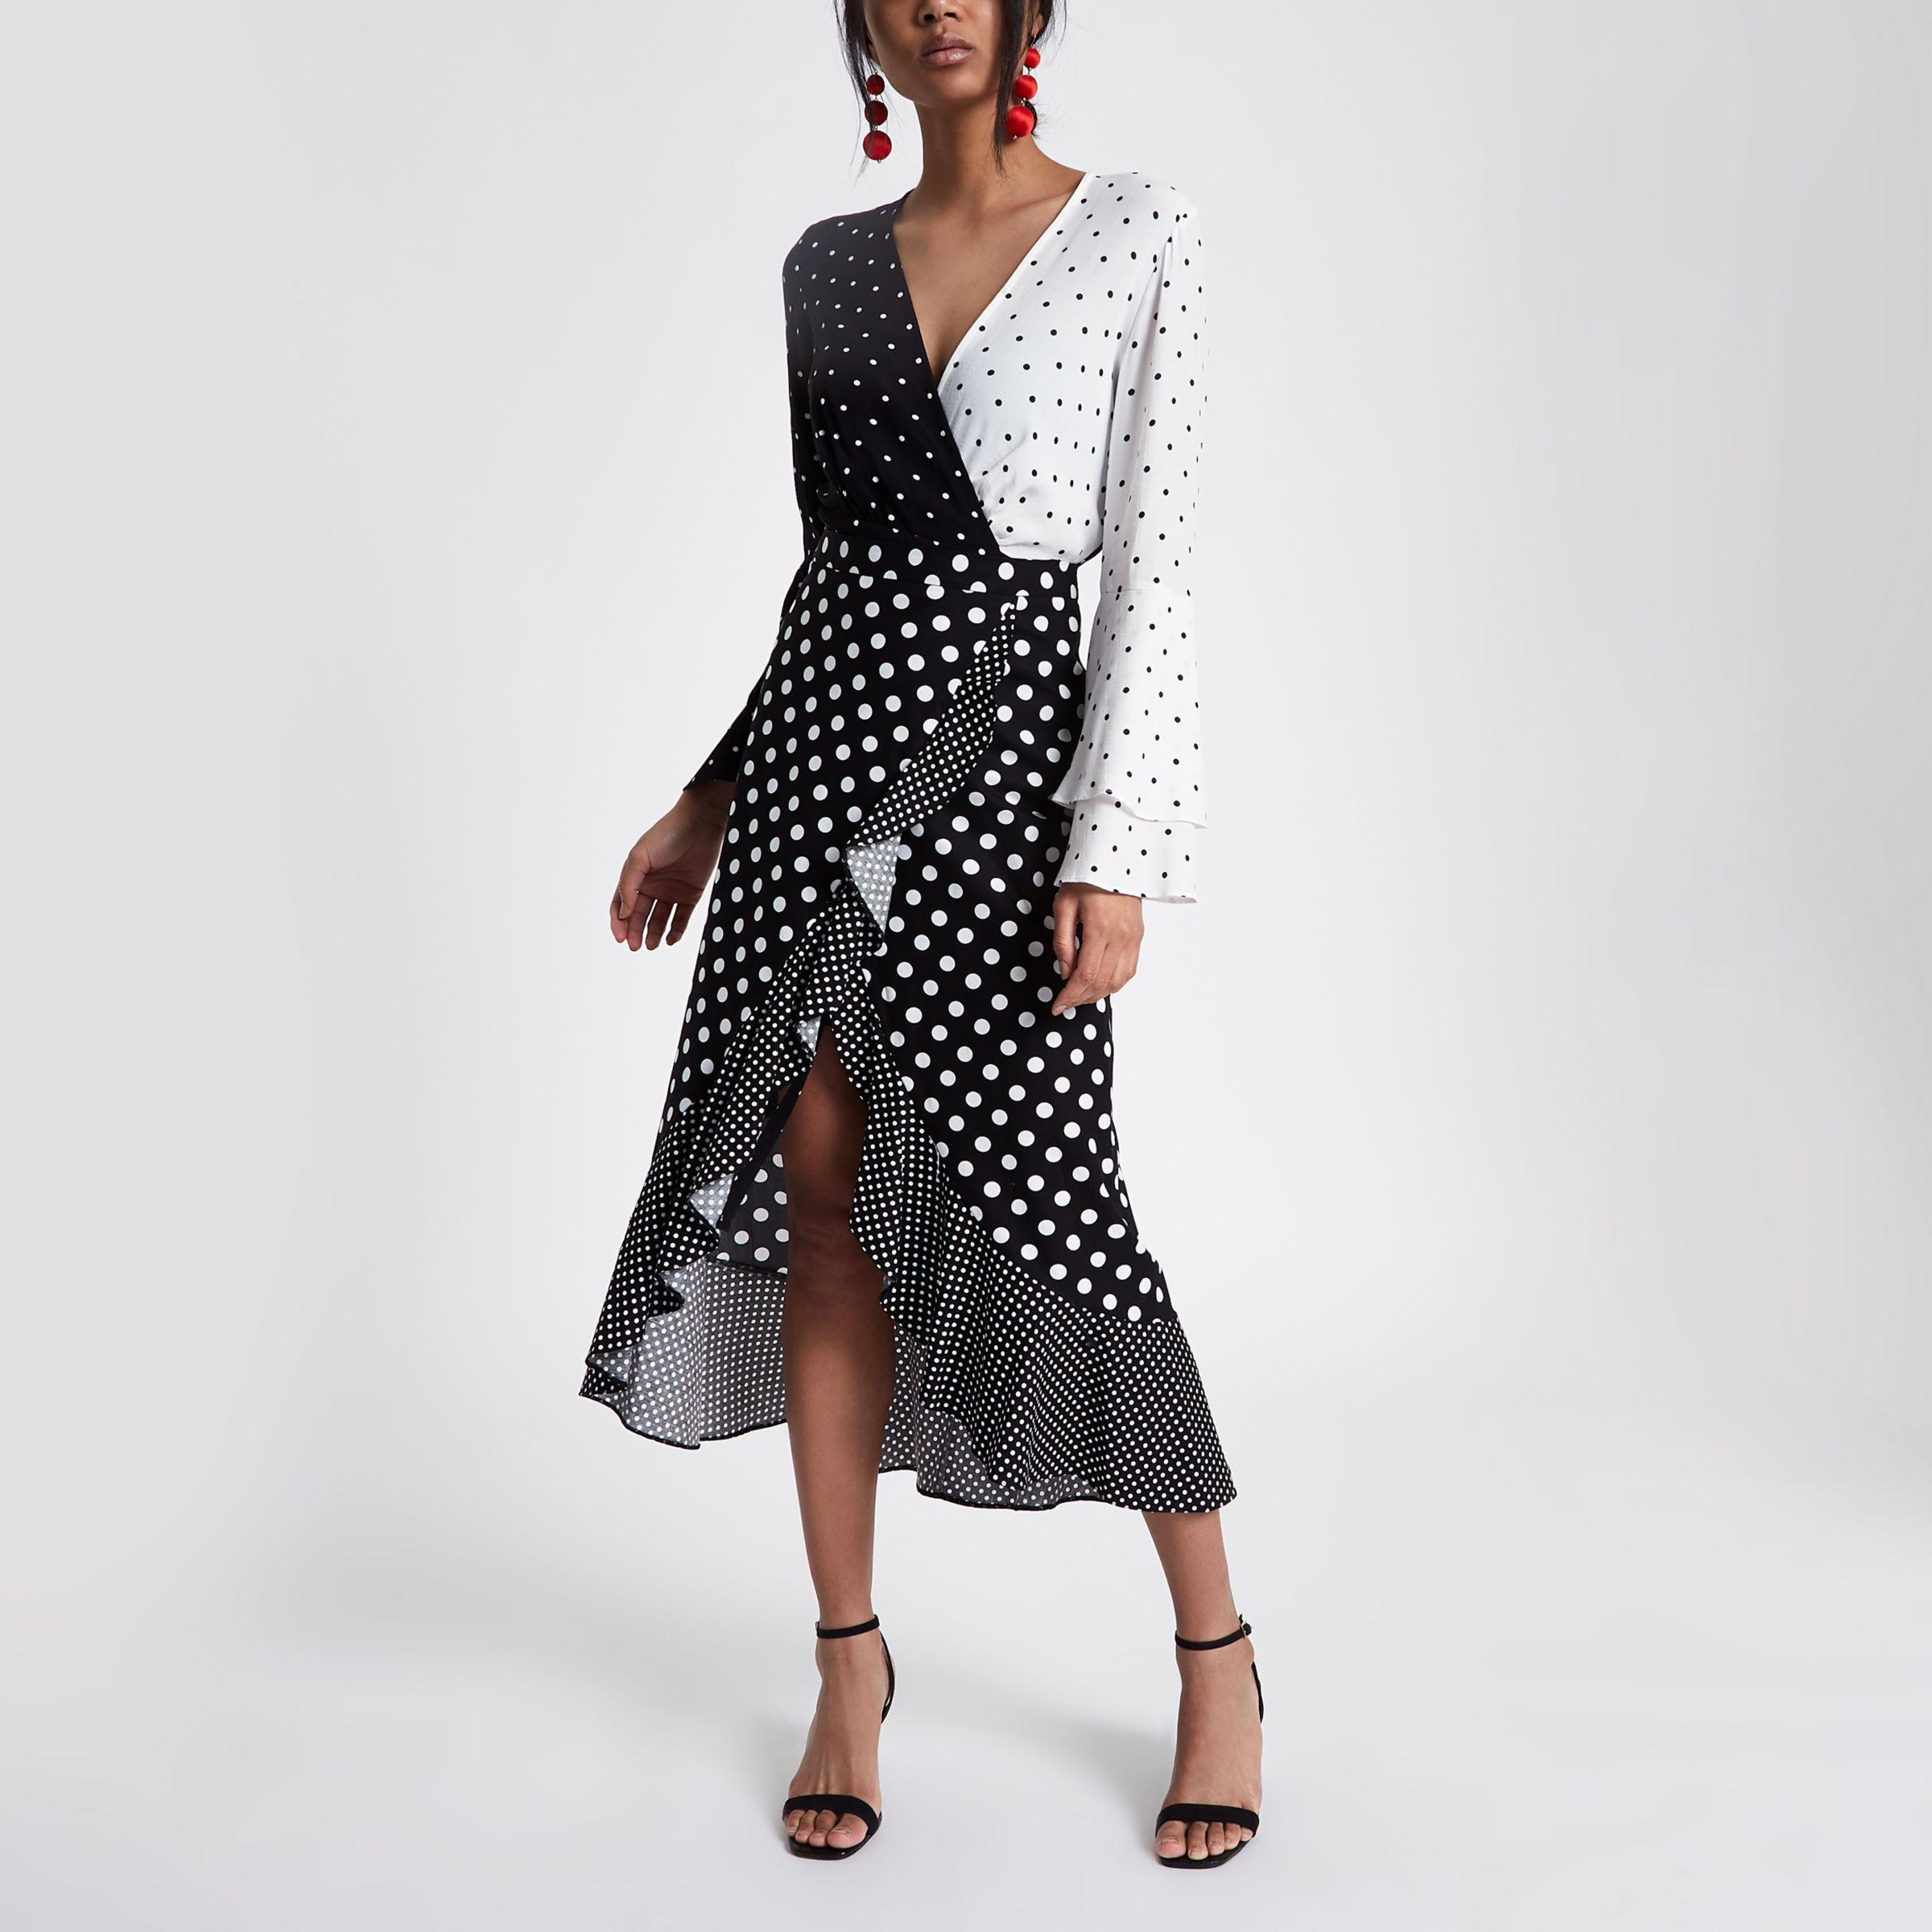 d92ee4c49602c River Island Black Polka Dot Frill Wrap Midi Skirt in Black - Lyst